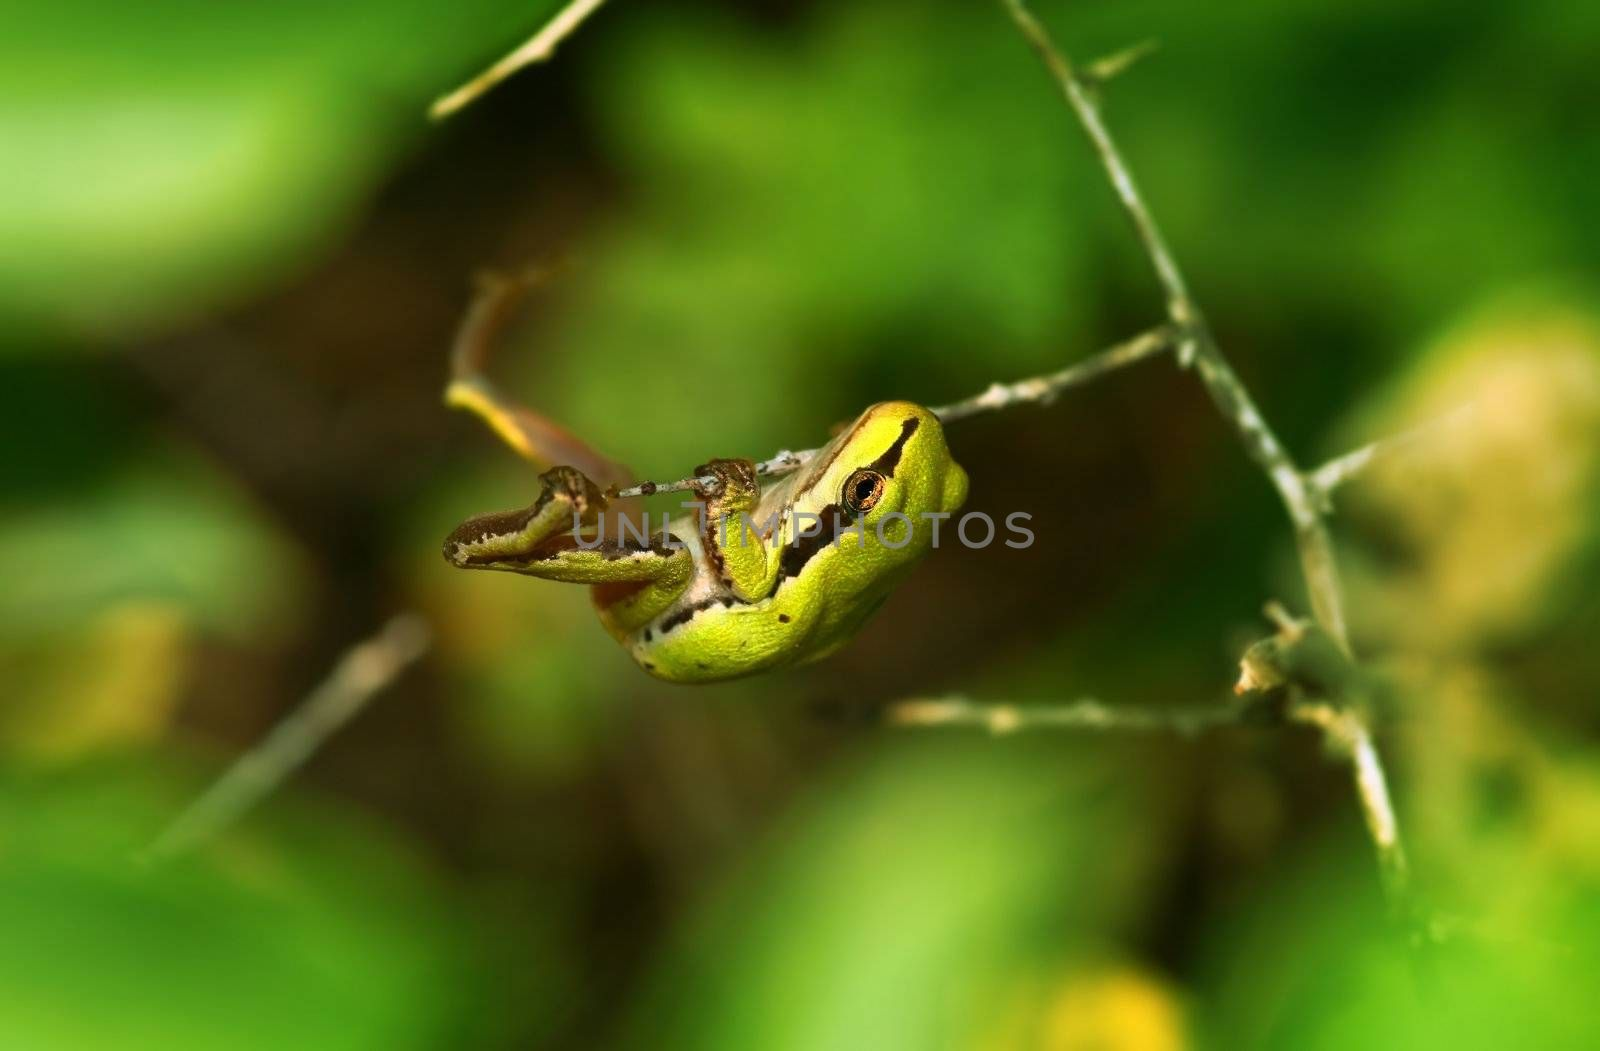 Wildlife. Green tree frog in its habitat